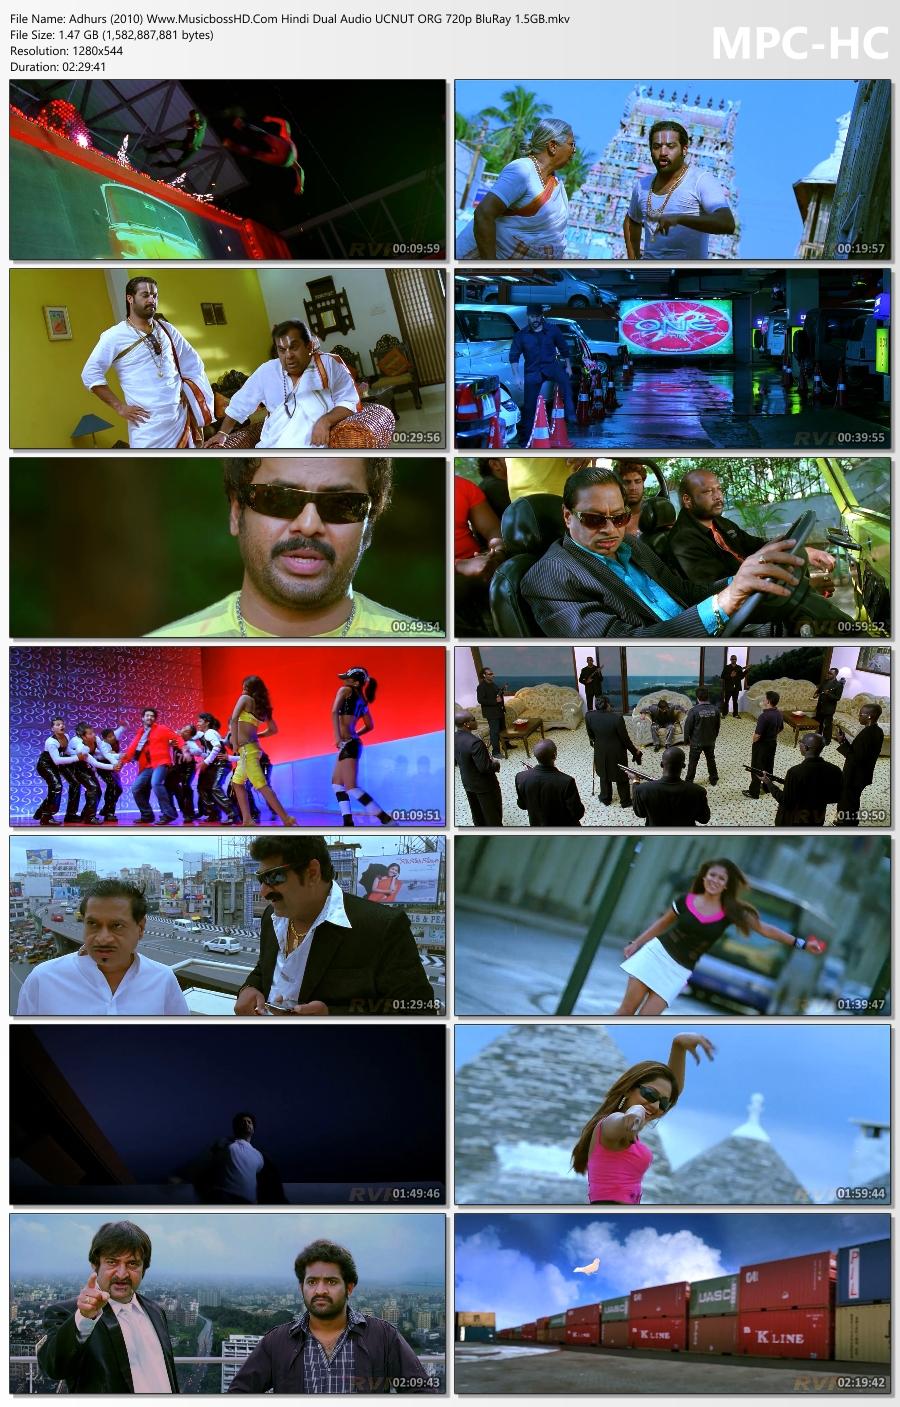 Adhurs-2010-Www-Musicboss-HD-Com-Hindi-Dual-Audio-UCNUT-ORG-720p-Blu-Ray-1-5-GB-mkv-thumbs